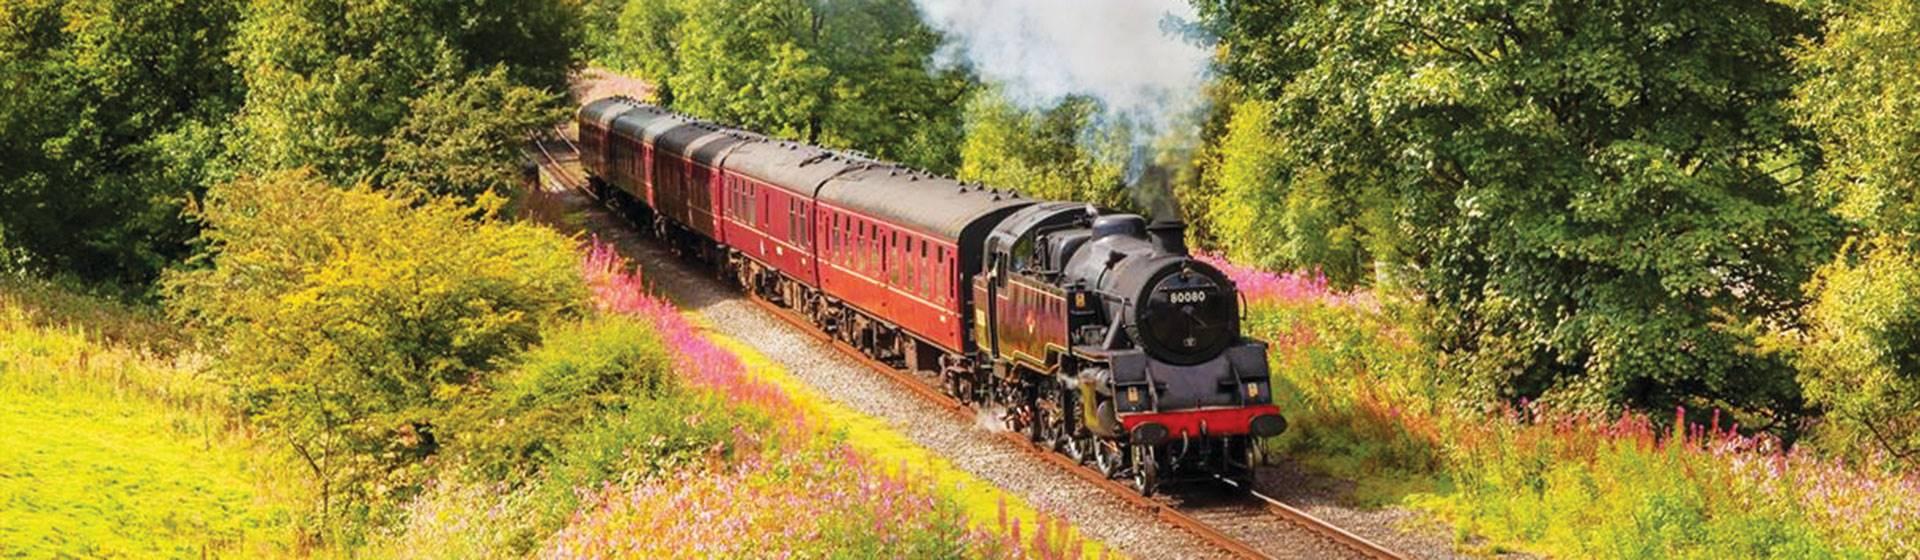 East Lancashire Steam Railway with Cream Tea